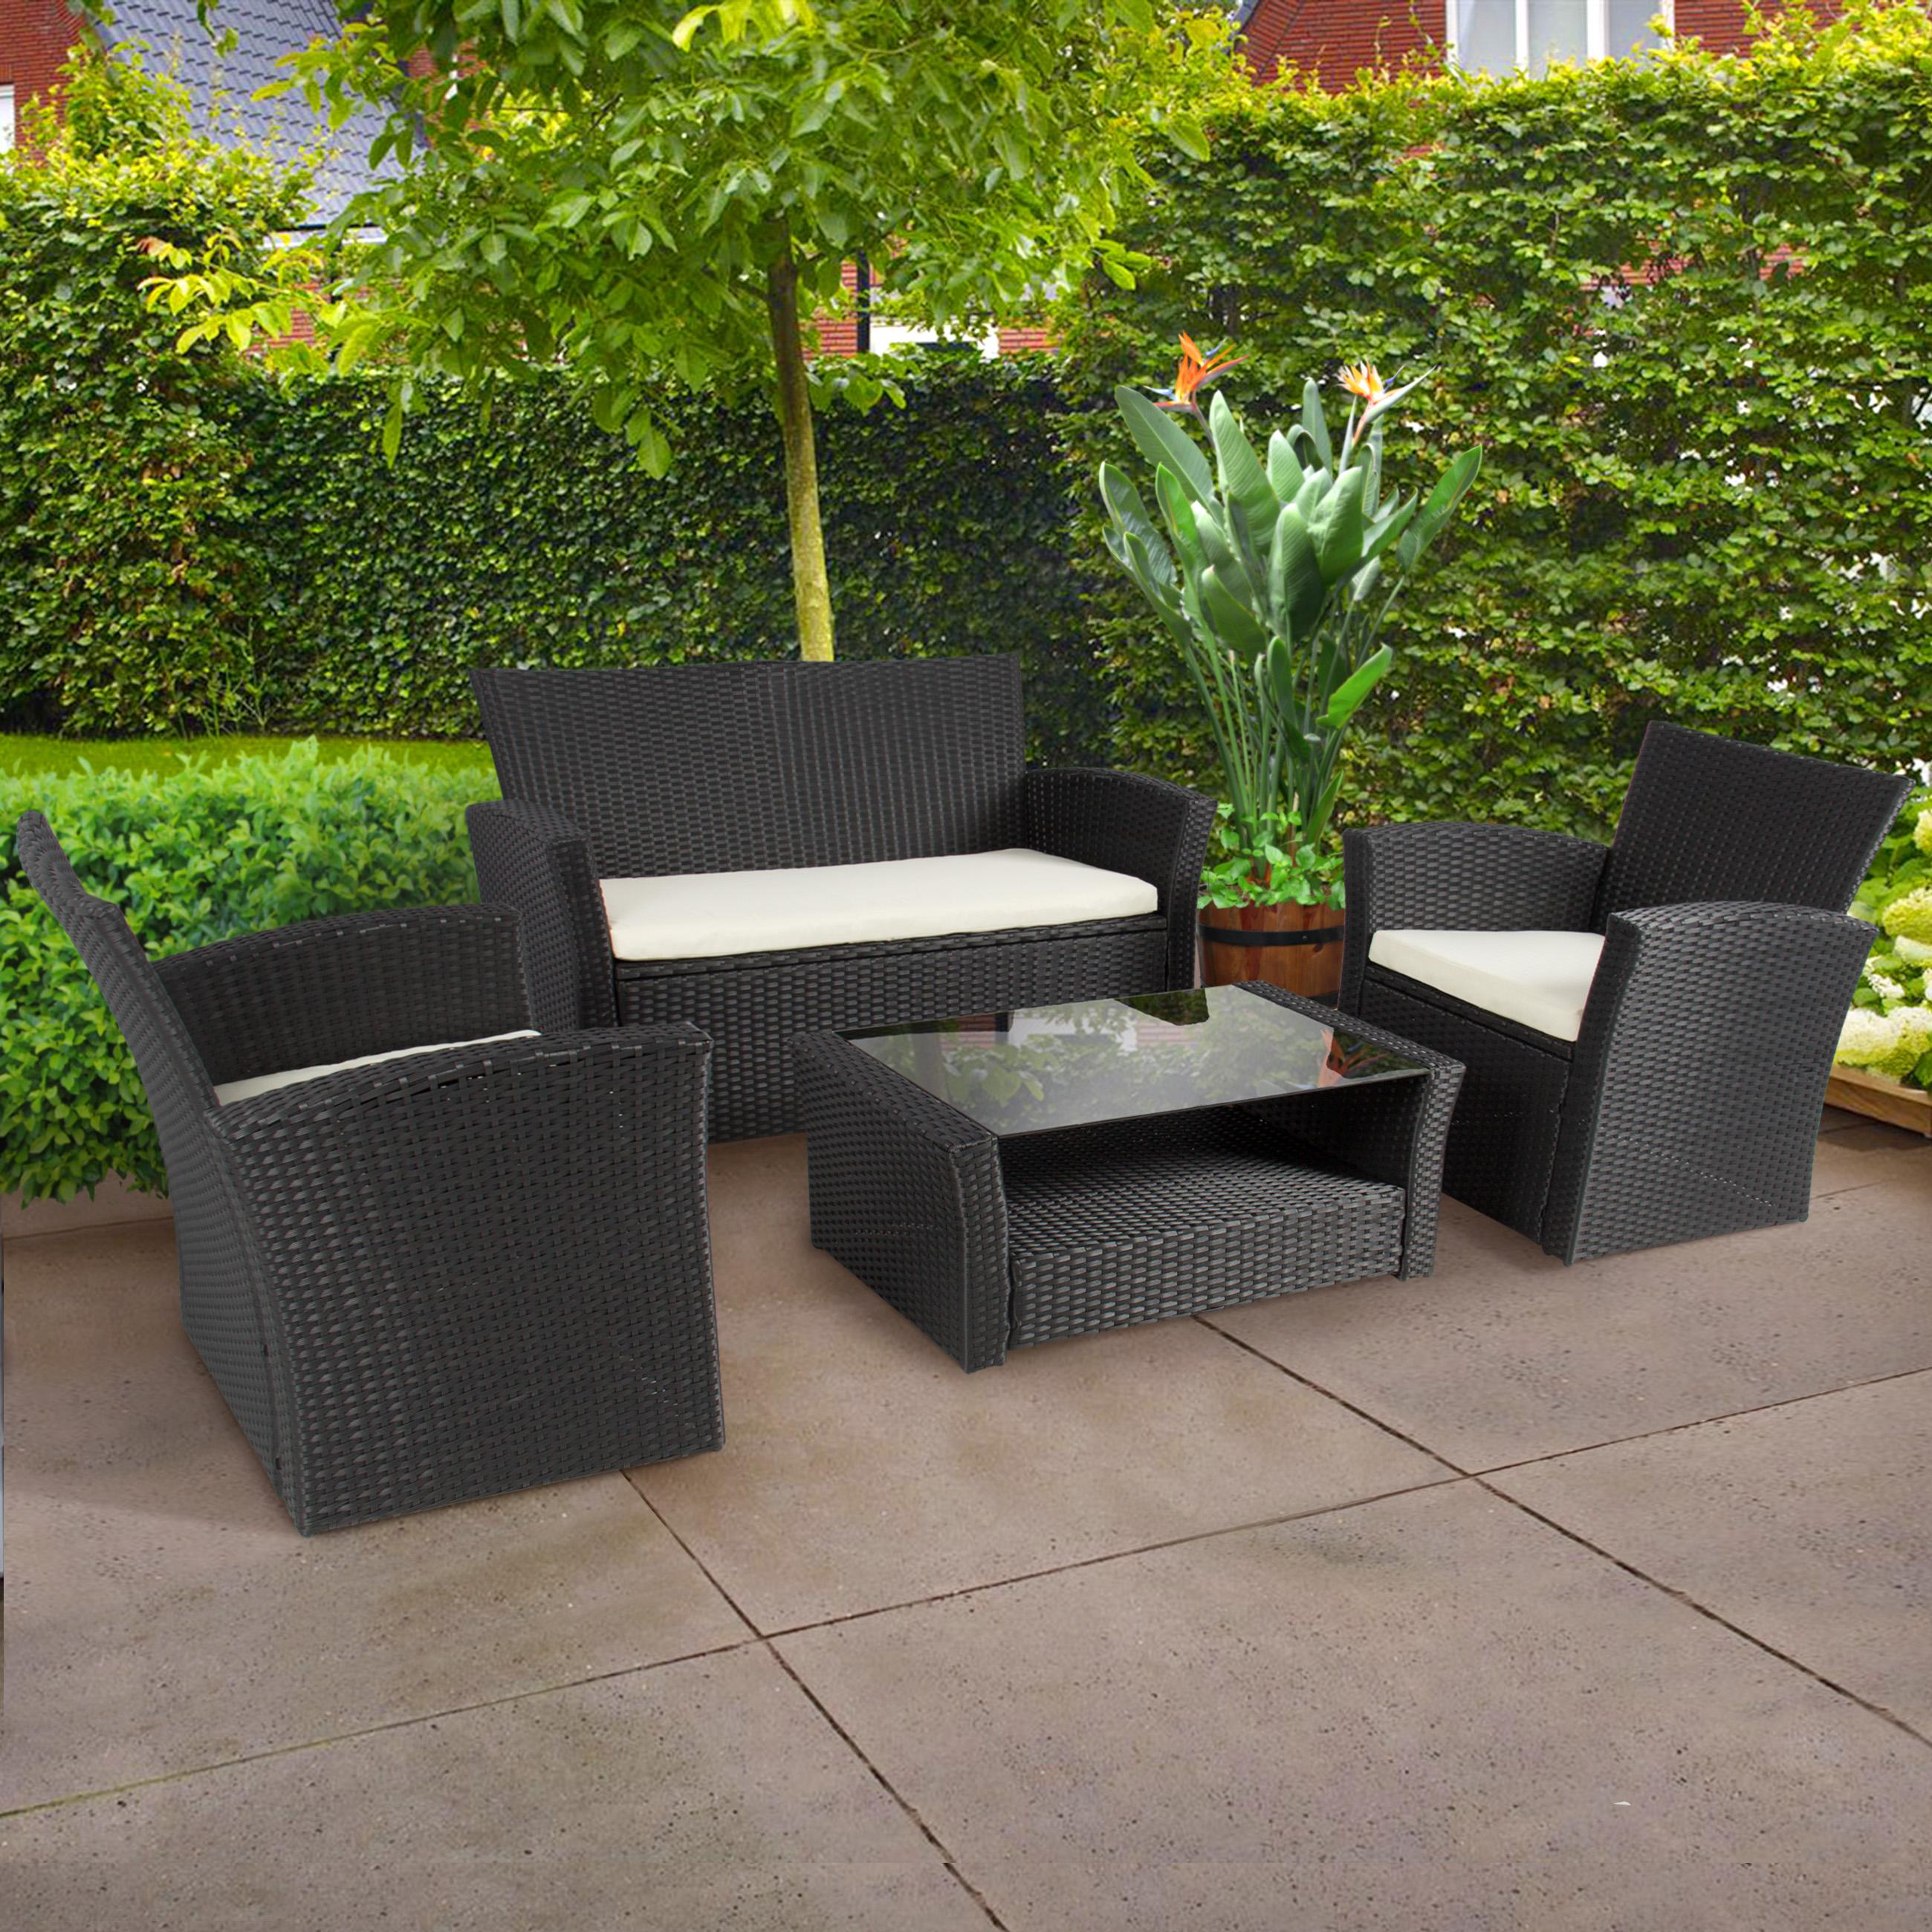 garden sets 4pc outdoor patio garden furniture wicker rattan sofa set black - HLSMRBN